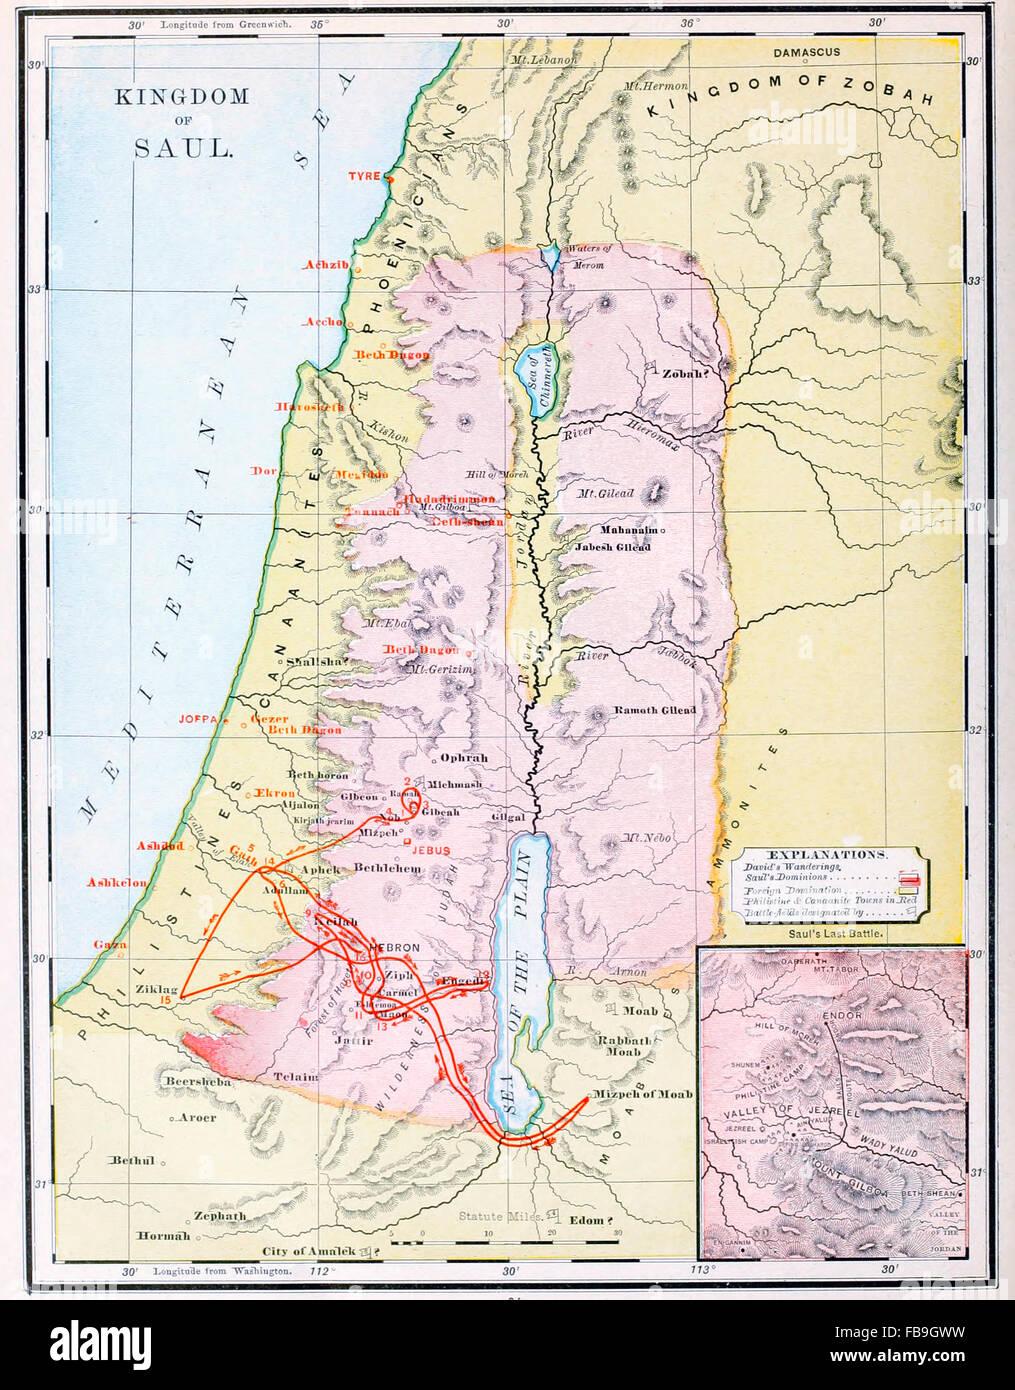 Old Map Of Israel Stockfotos & Old Map Of Israel Bilder